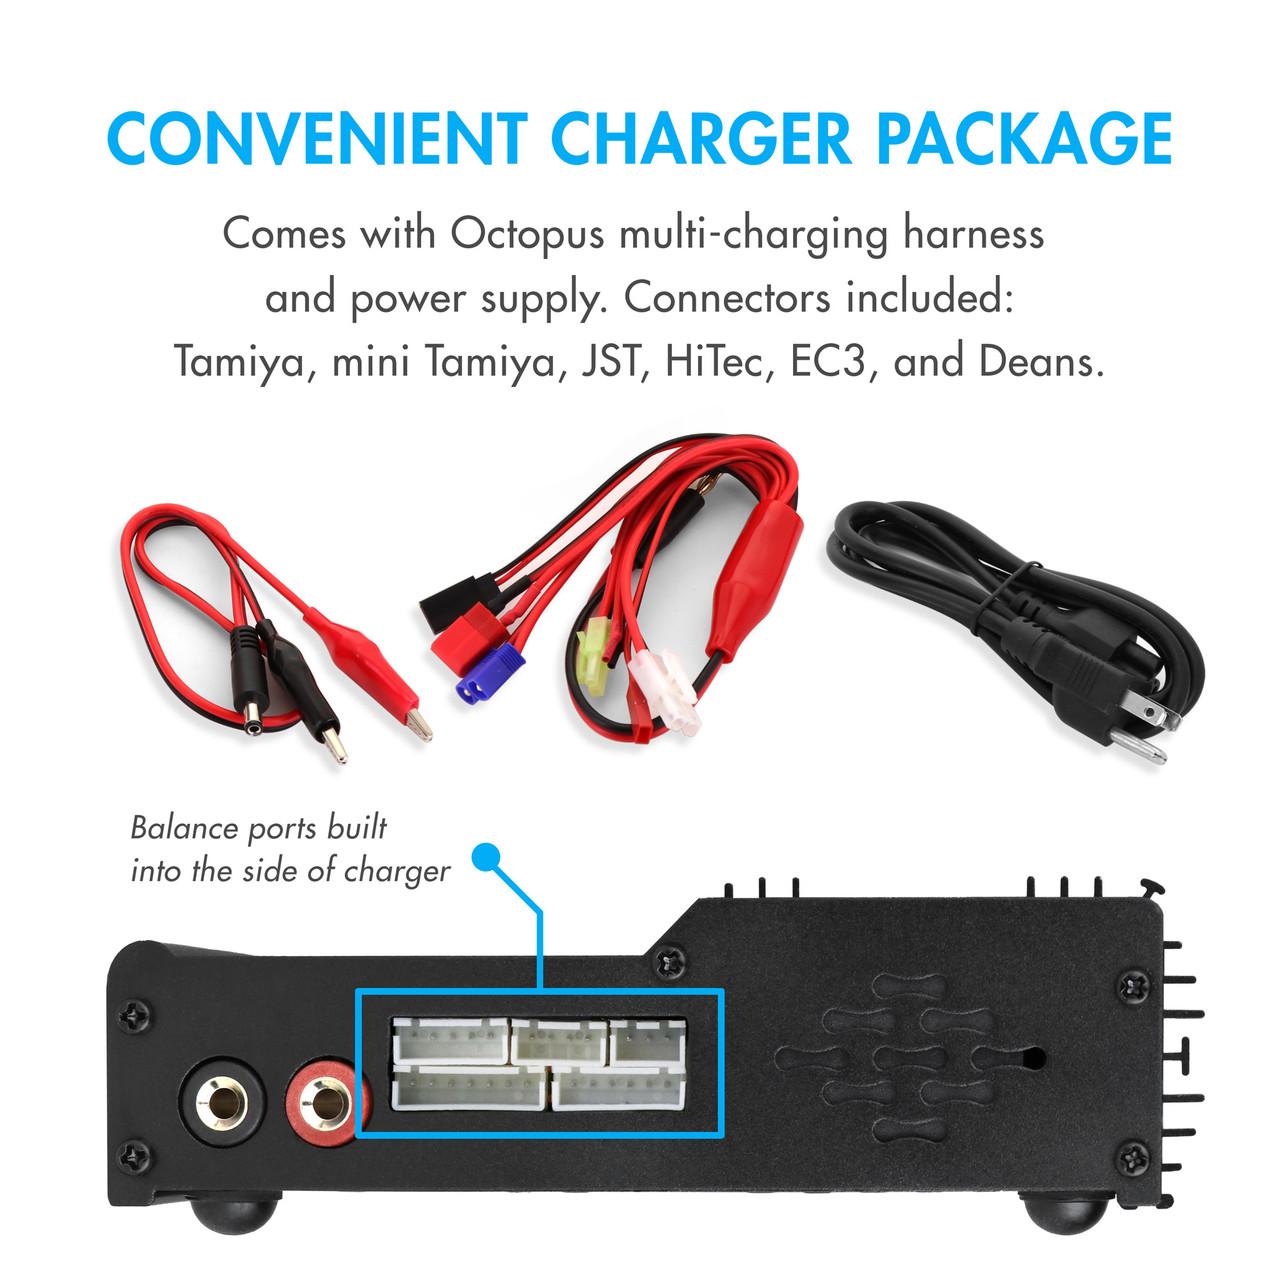 Tenergy TB6AC+80W 8A Intelligent Digital Balance Charger for NiMH/NiCd/LiPo/Li-Fe/SLA